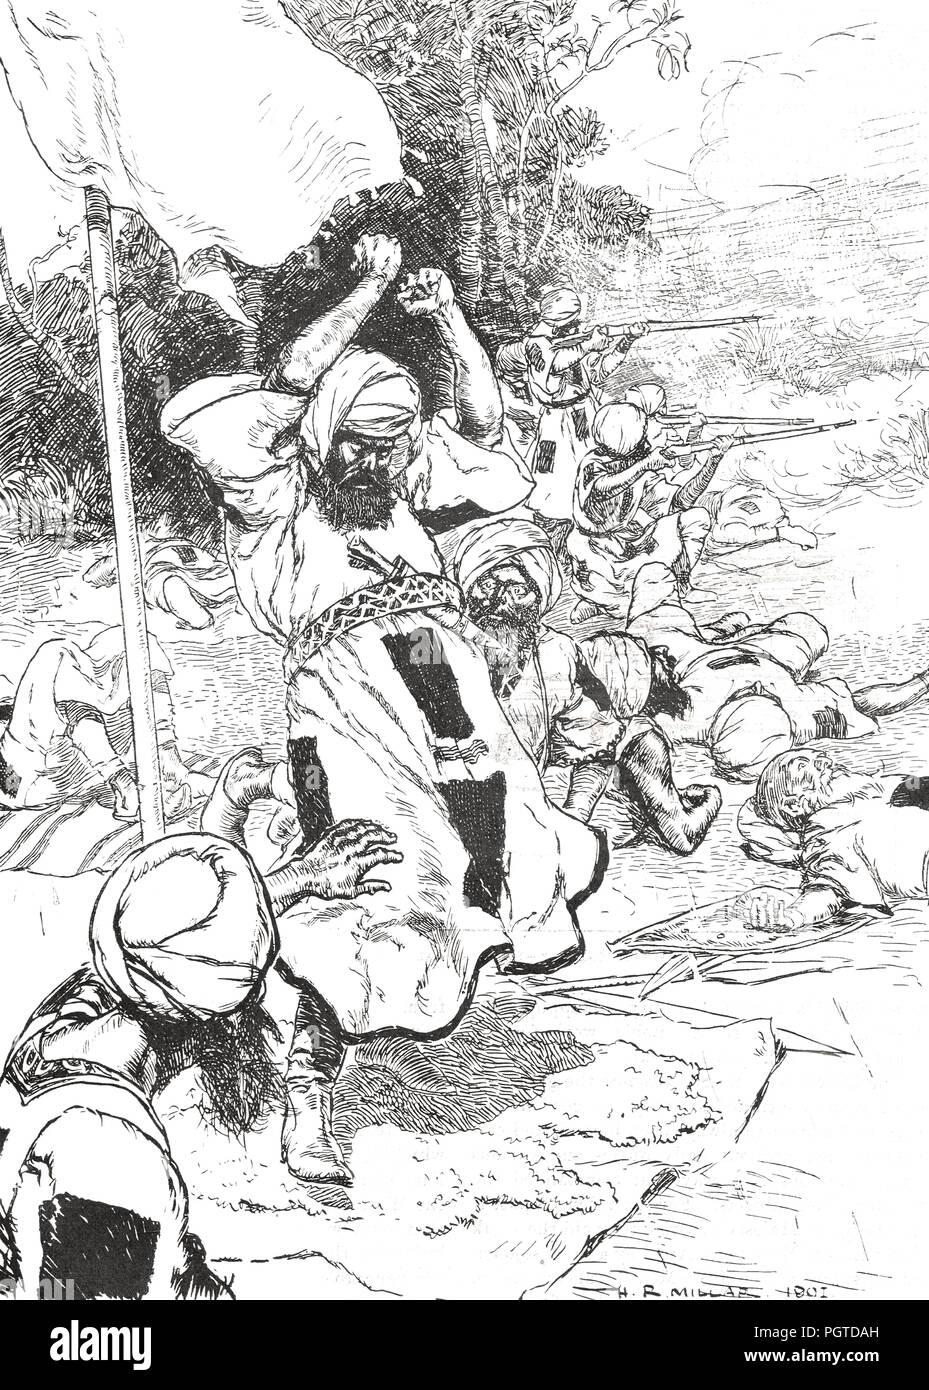 The death of the Khalifa, Abdullah Ibn-Mohammed, 25 November 1899, killed by Sir Reginald Wingate's Egyptian column at Umm Diwaikarat, Kordofan, Sudan - Stock Image